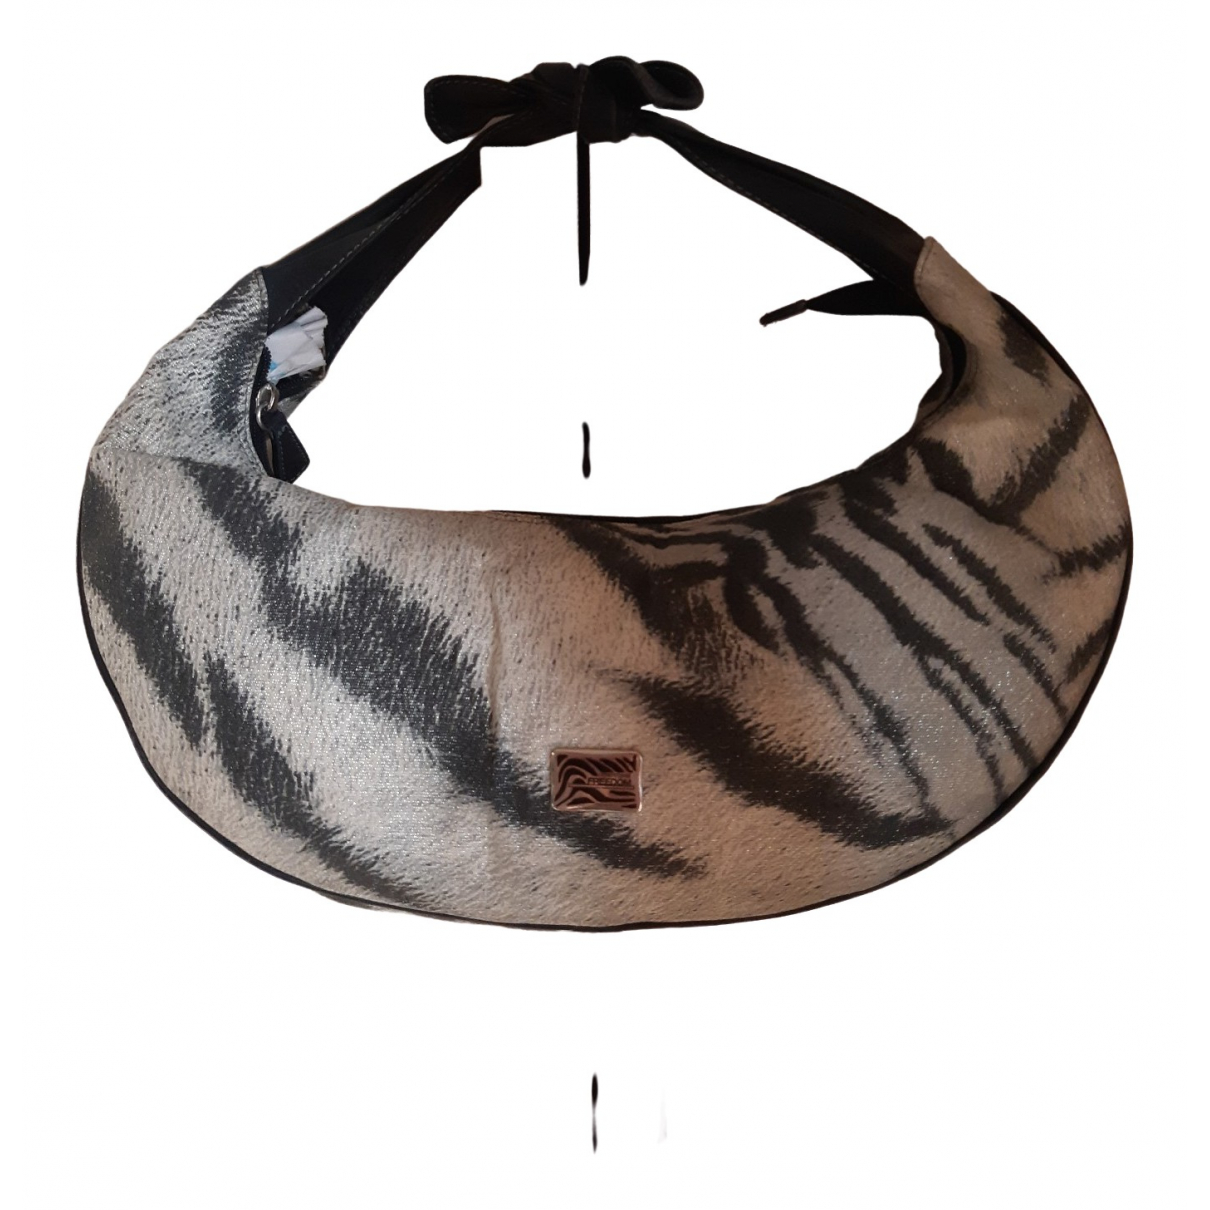 Roberto Cavalli N Grey Cloth handbag for Women N